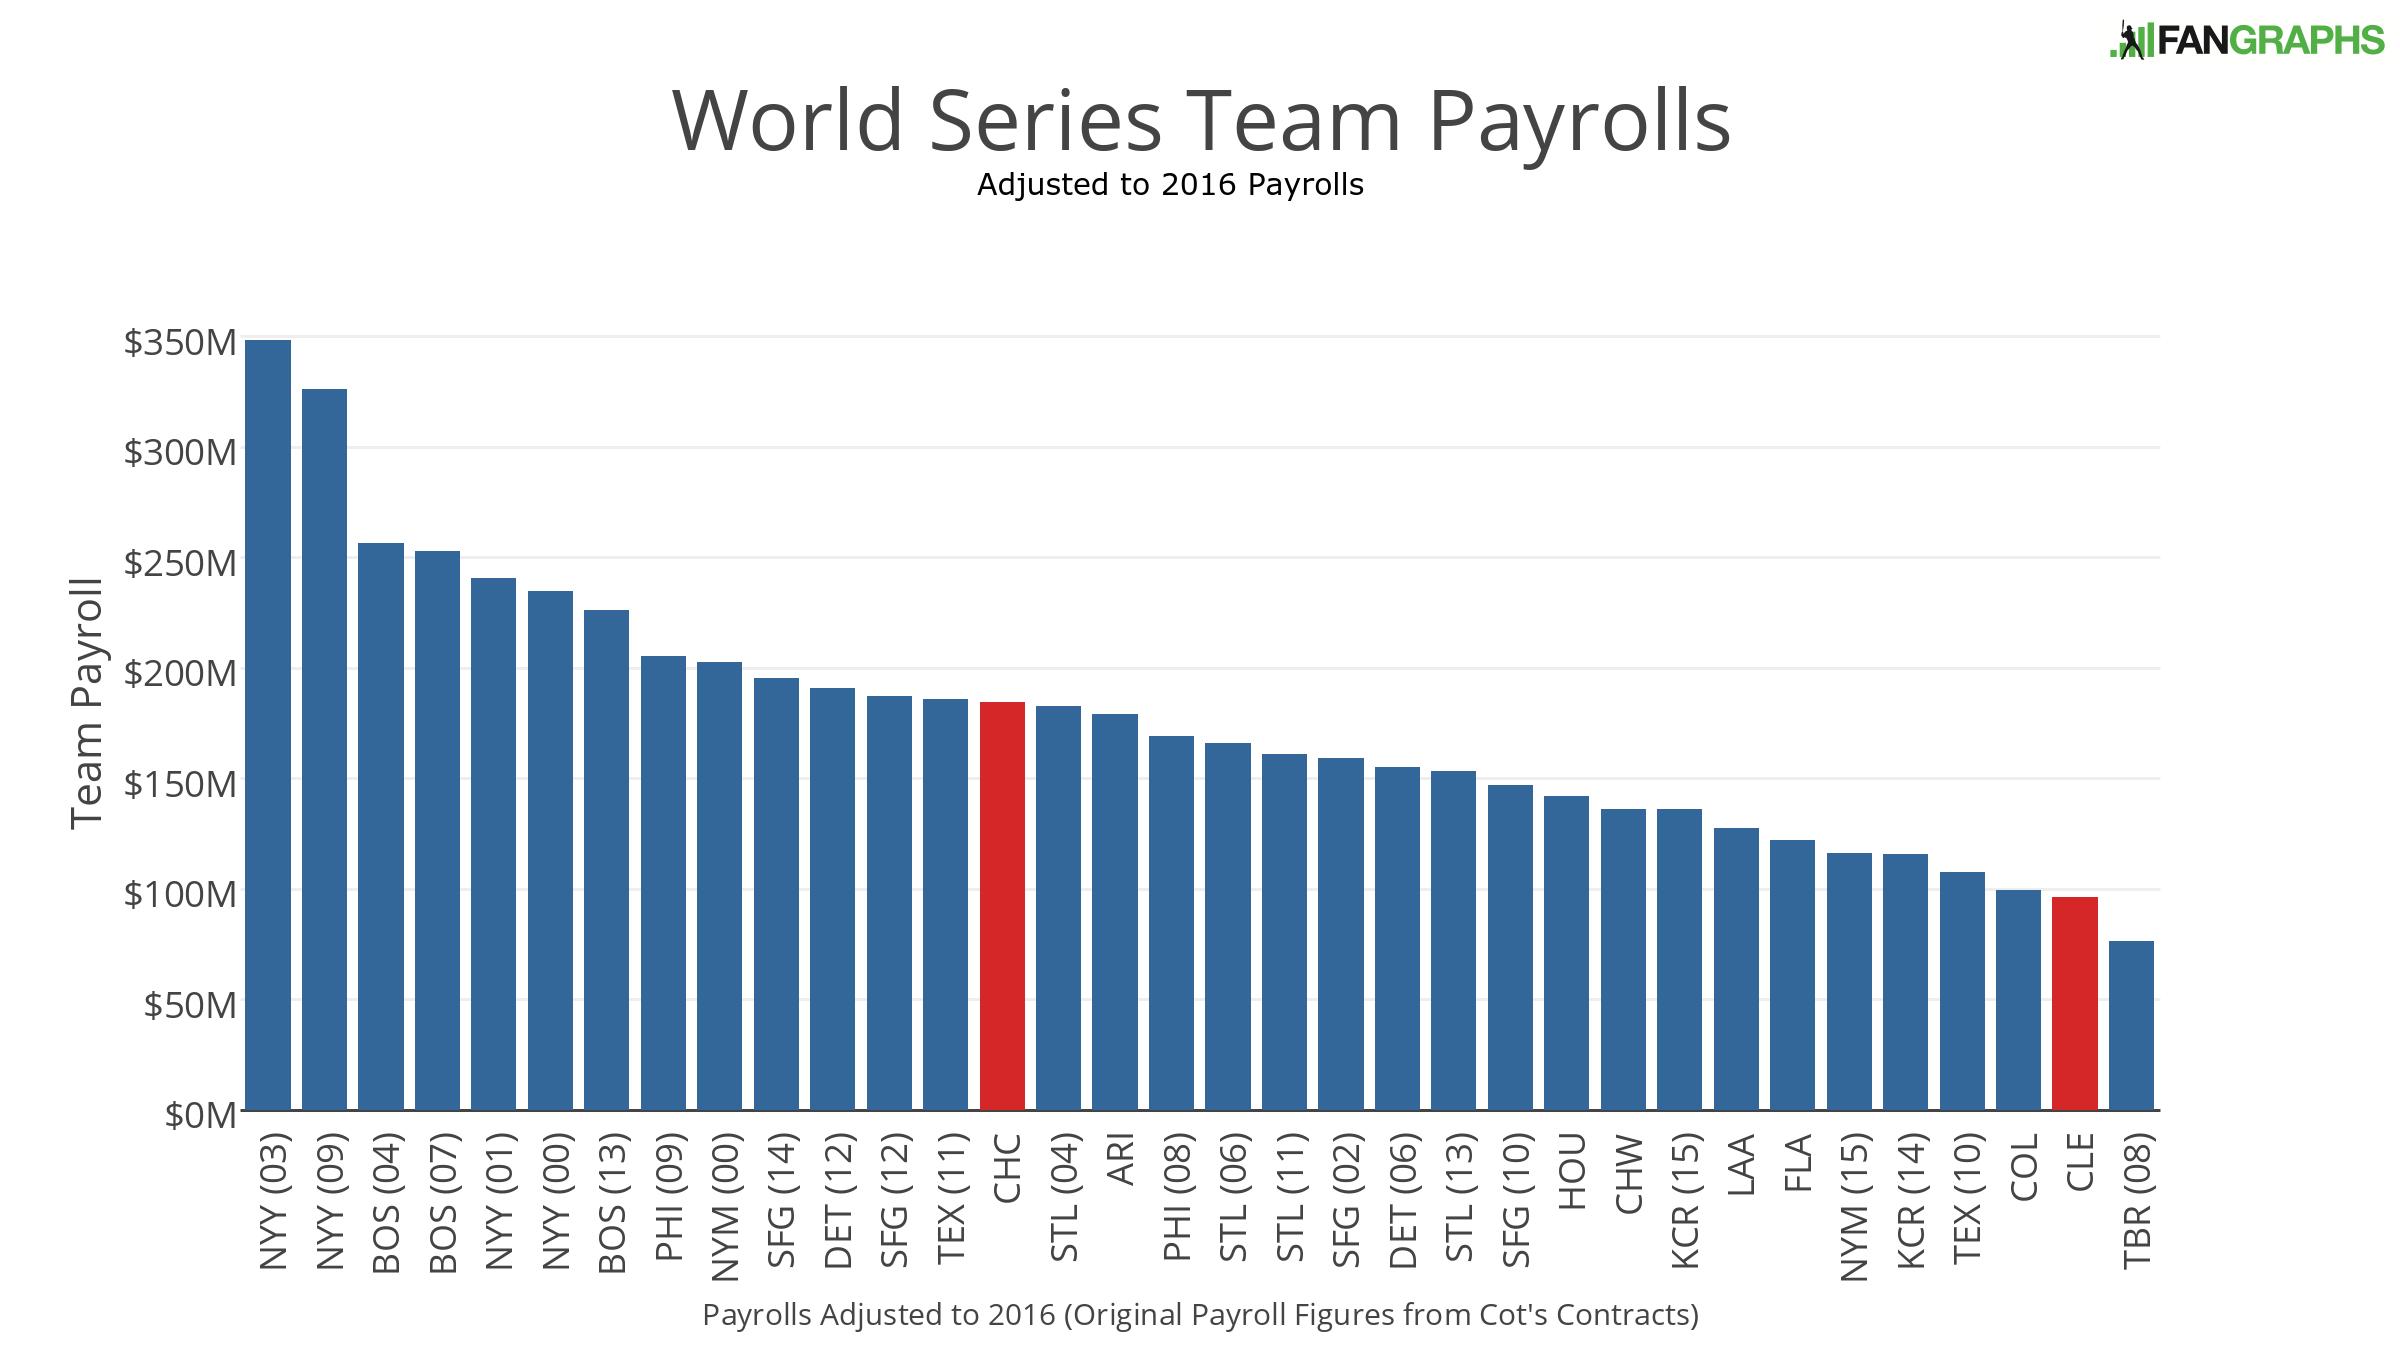 world-series-team-payrolls-1